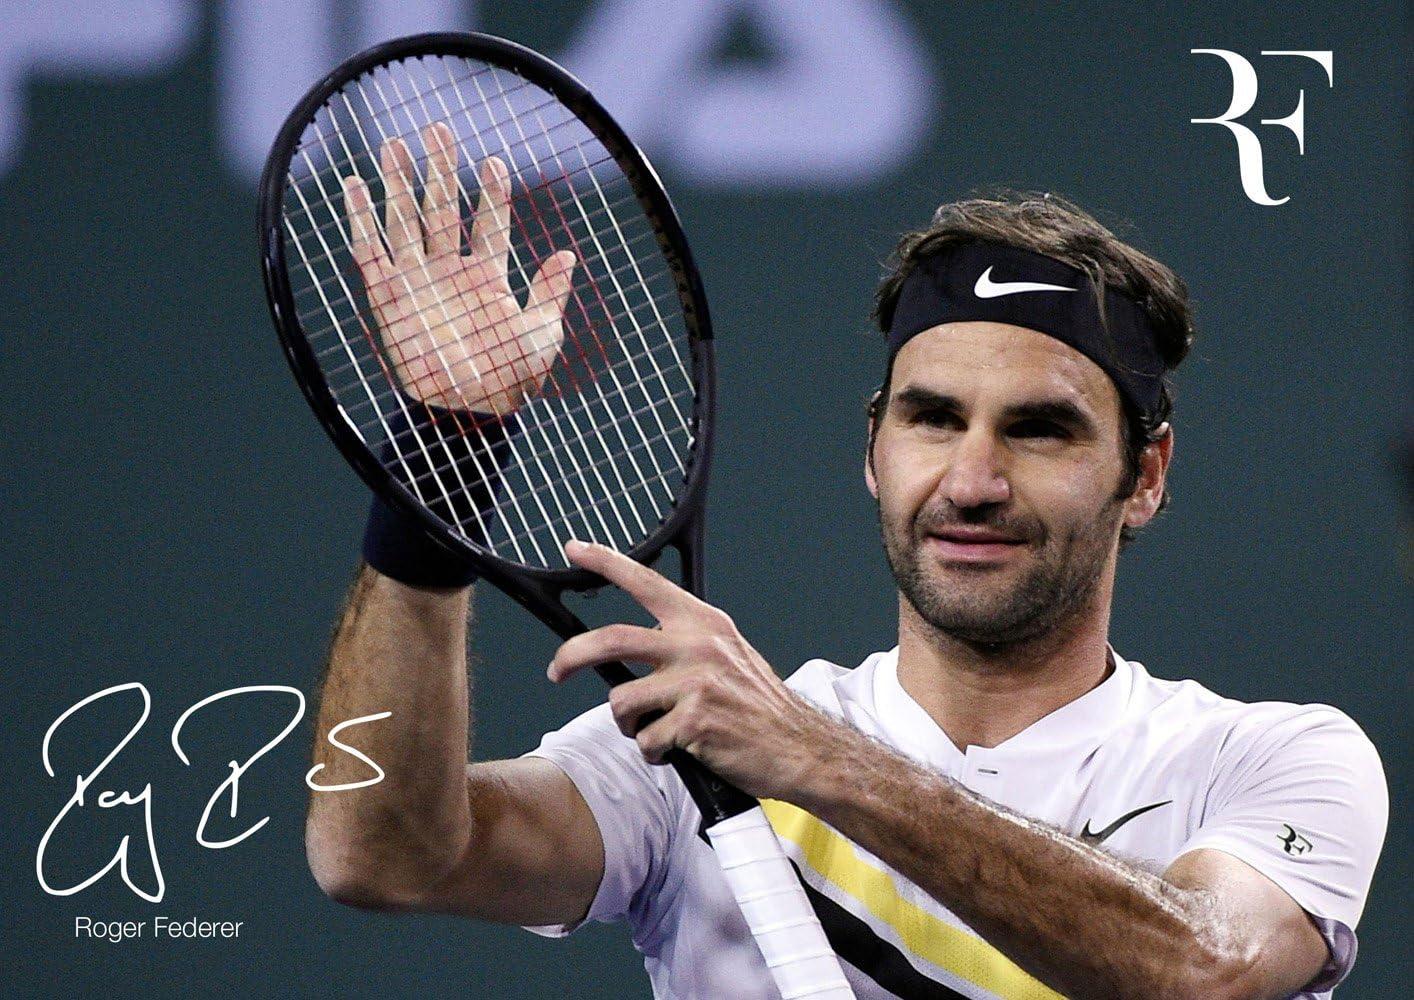 Amazon.de: Salopian Sales Motivierendes Poster mit Roger Federer # 33 –  Motivation –